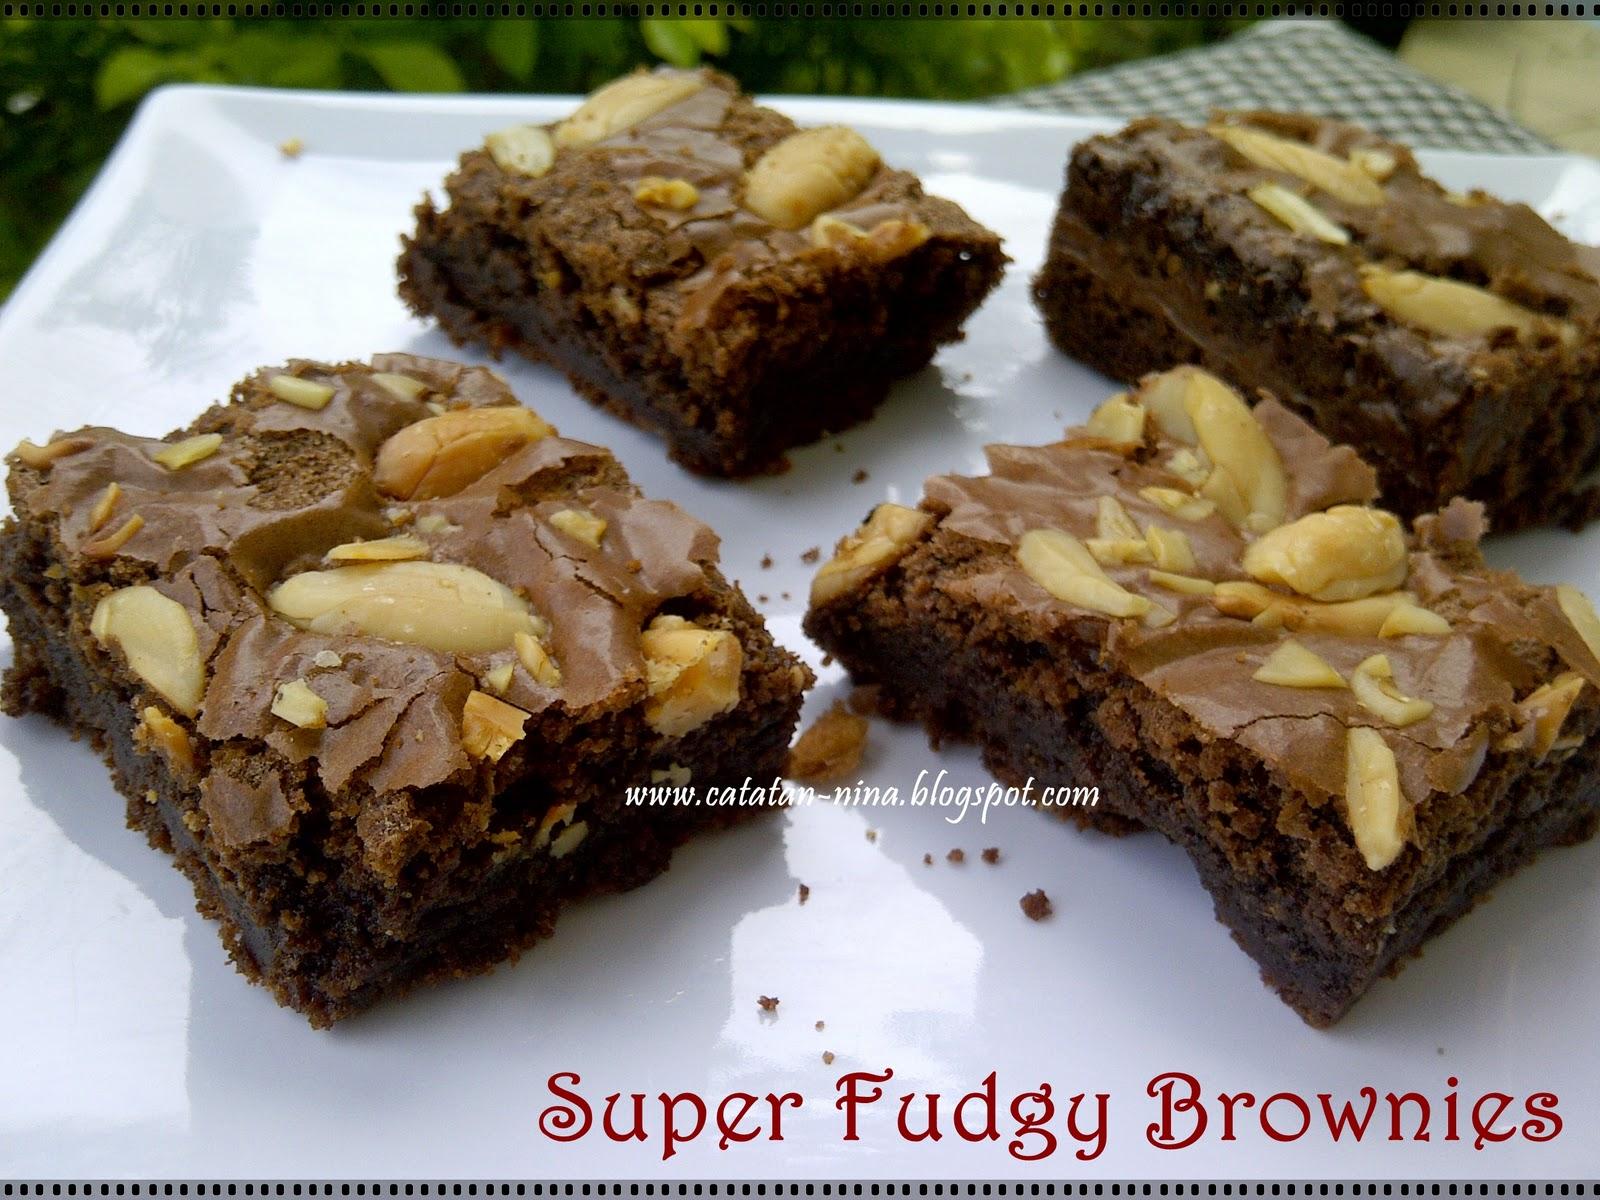 Super Fudgy Brownies by Dapoer HaHa